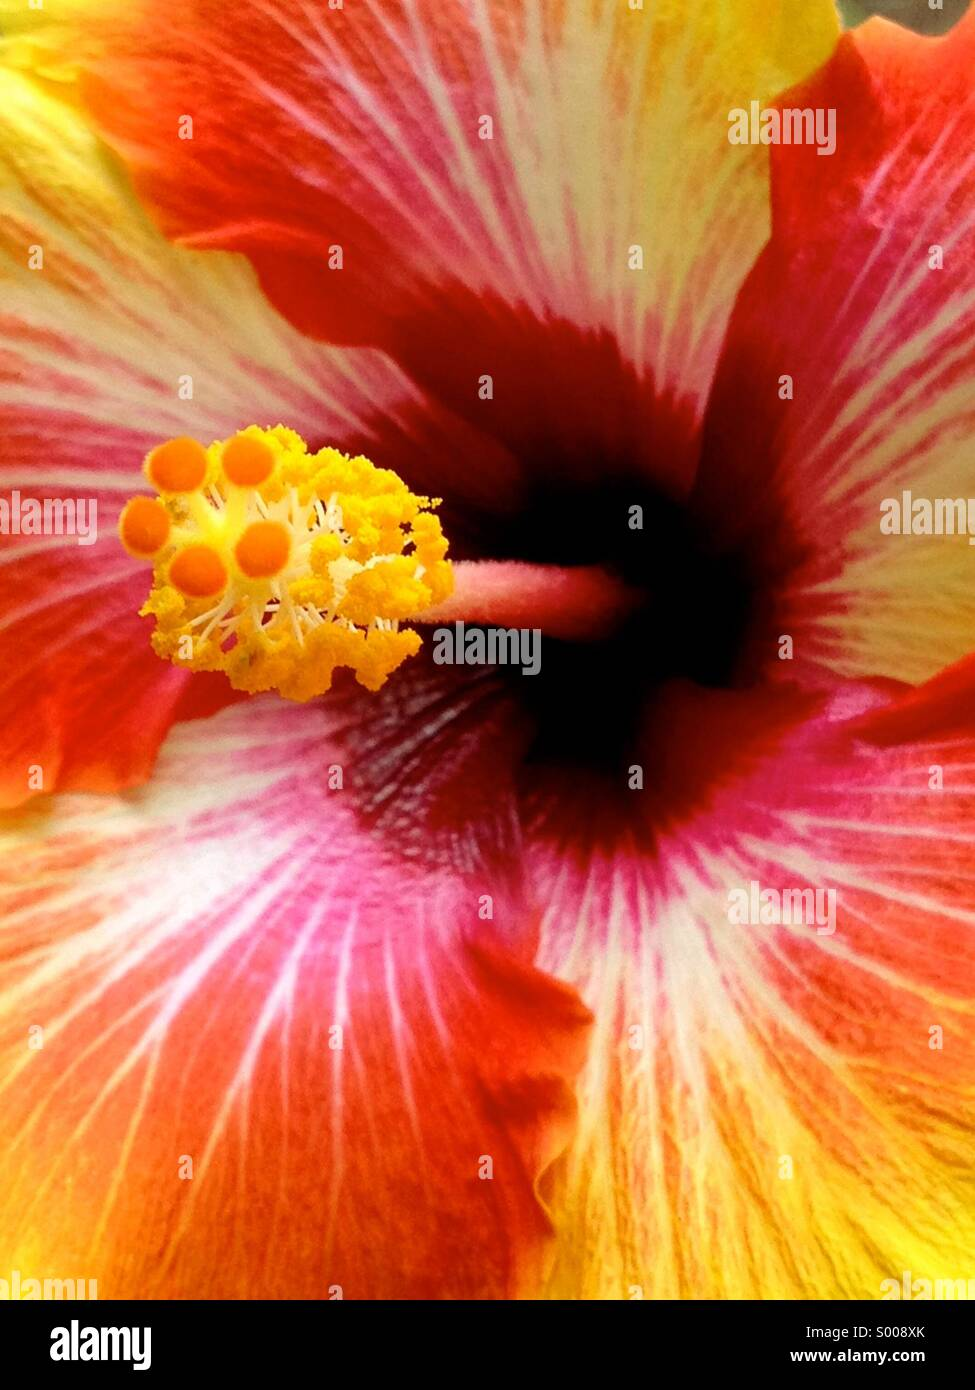 Closeup of hibiscus flower - Stock Image